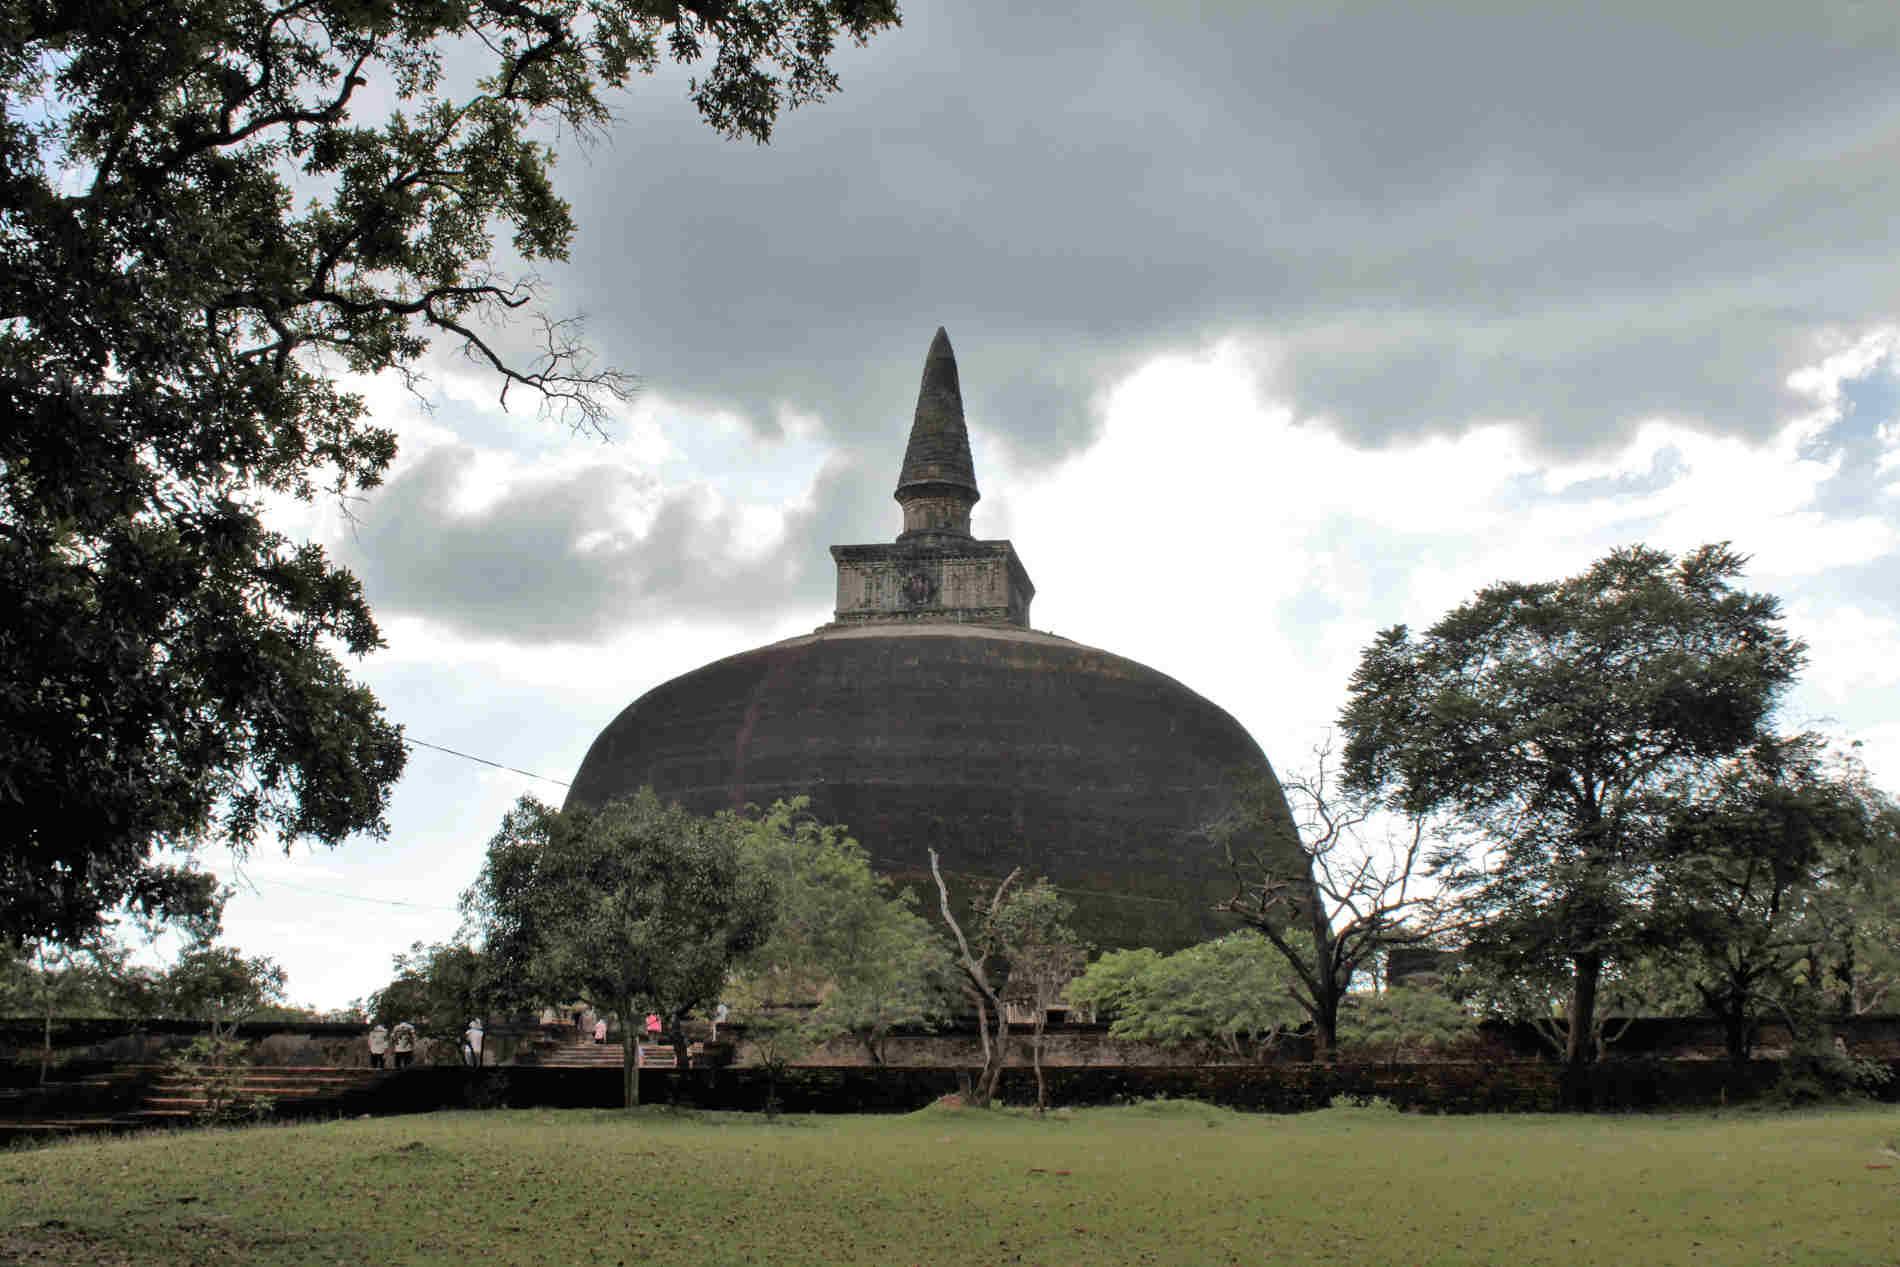 viaggio in Sri Lanka Anuradhapura